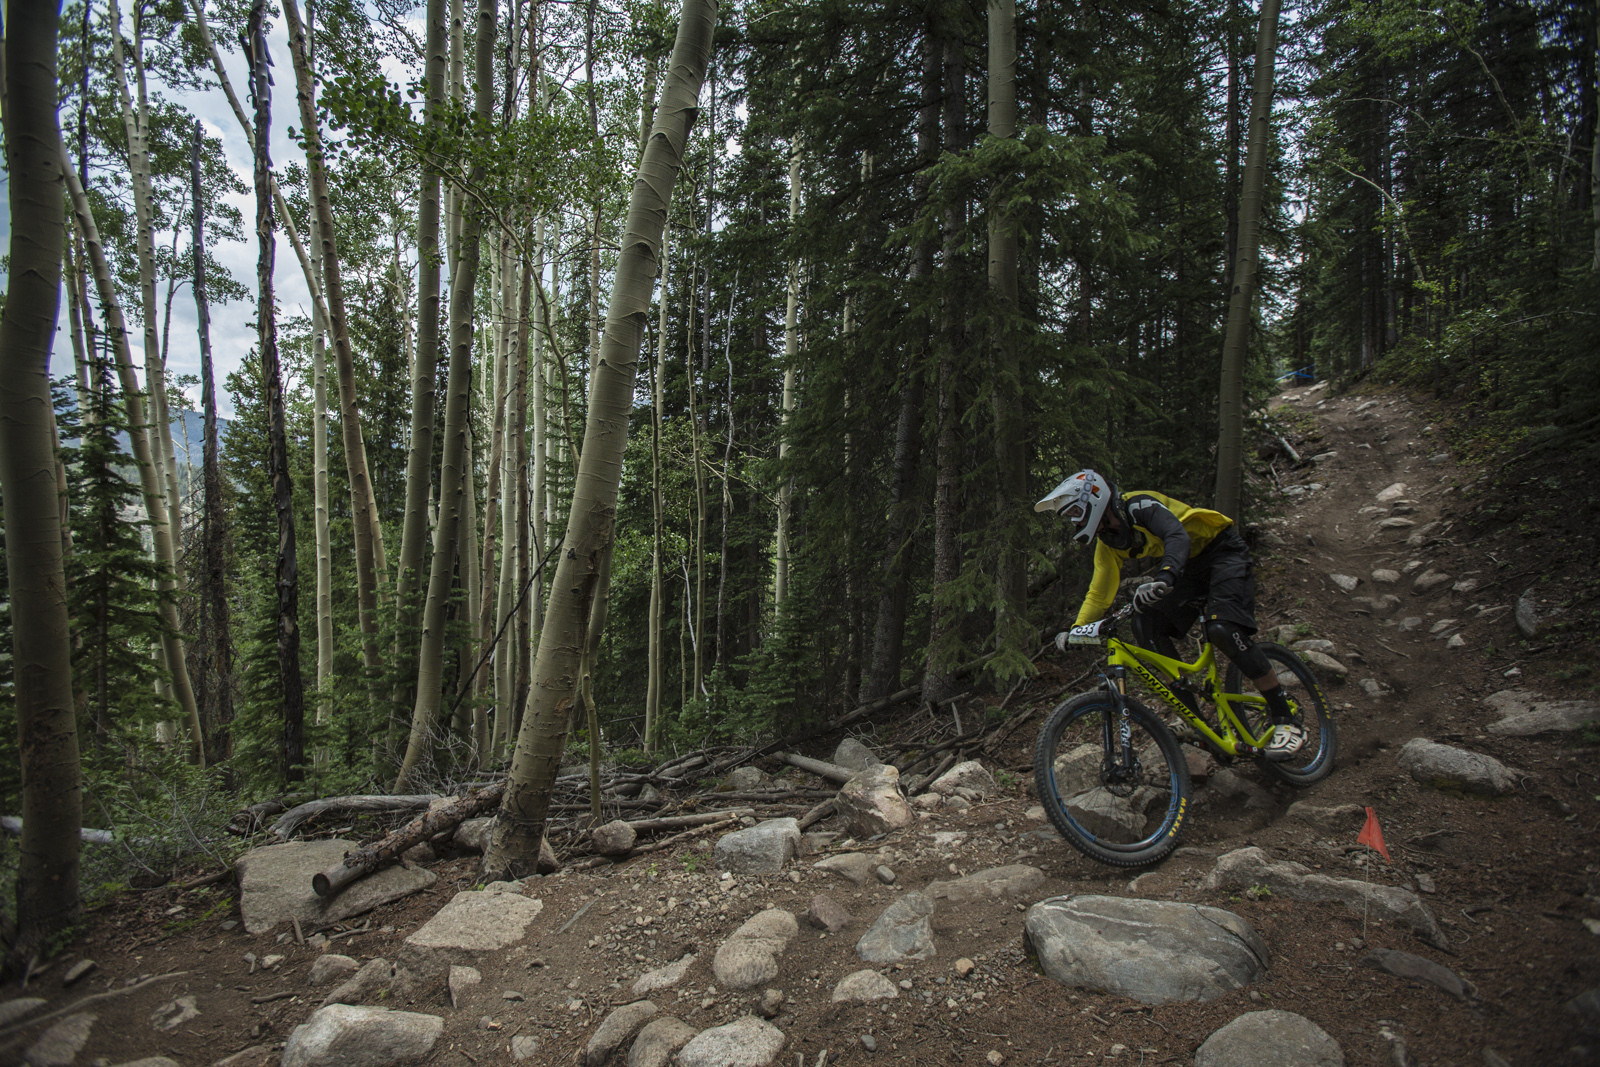 Dylan Stucki Keystone Big Mountain Enduro - Photos, Videos from the Keystone Big Mountain Enduro, Part of the North American Enduro Tour - Mountain Biking Pictures - Vital MTB